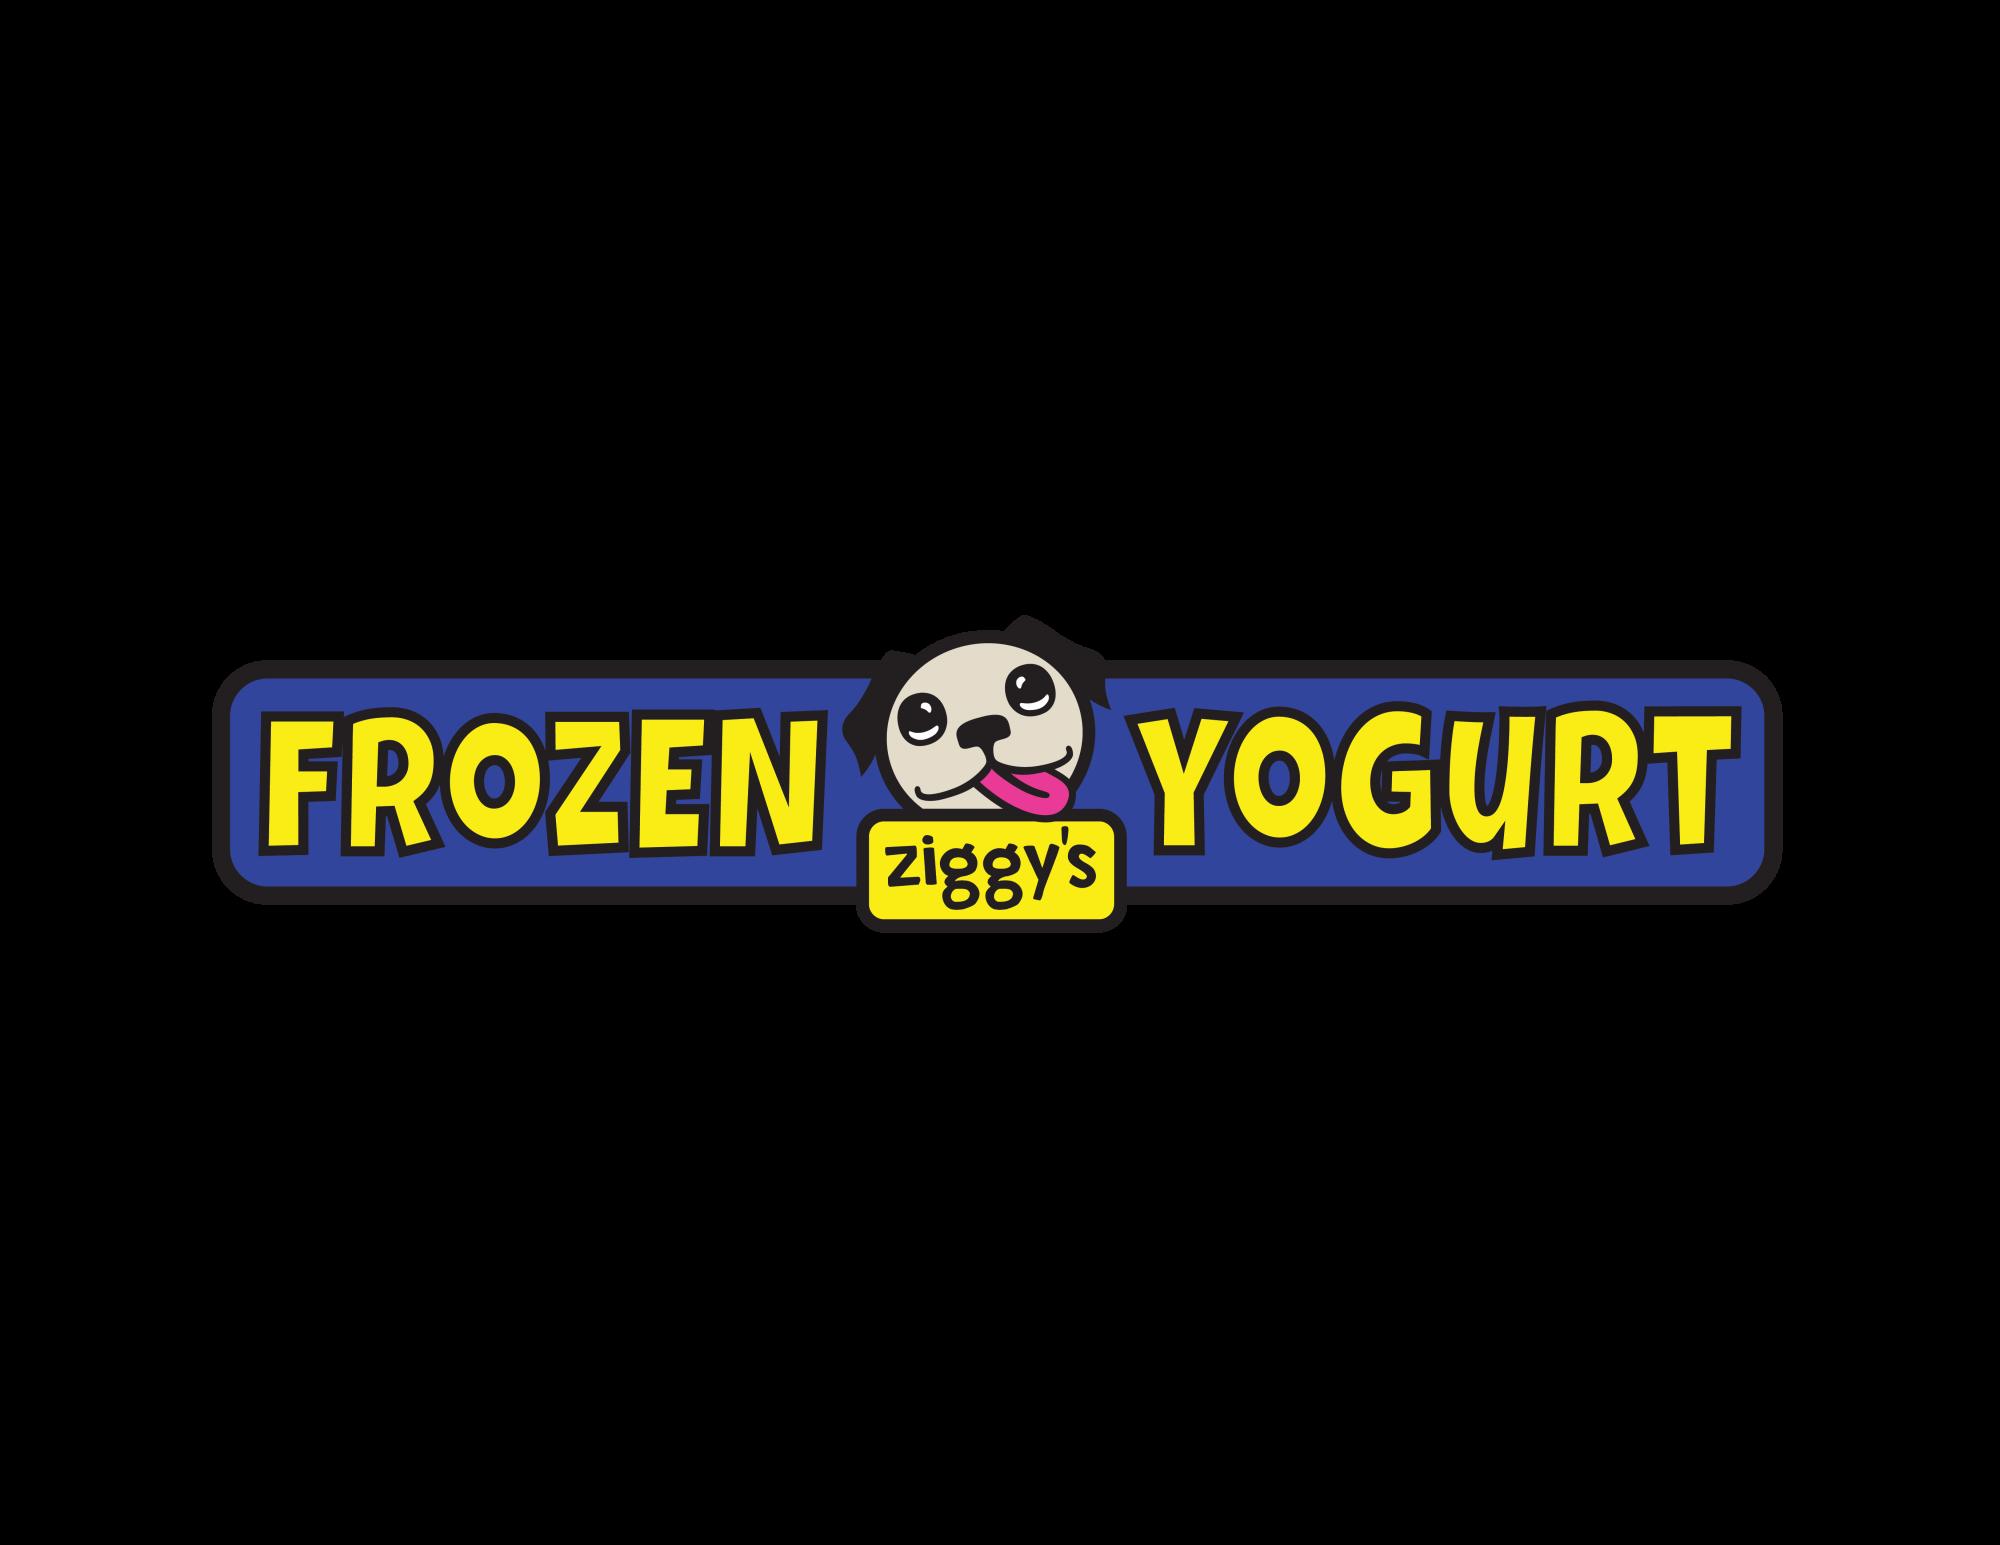 Ziggy's Frozen Yogurt